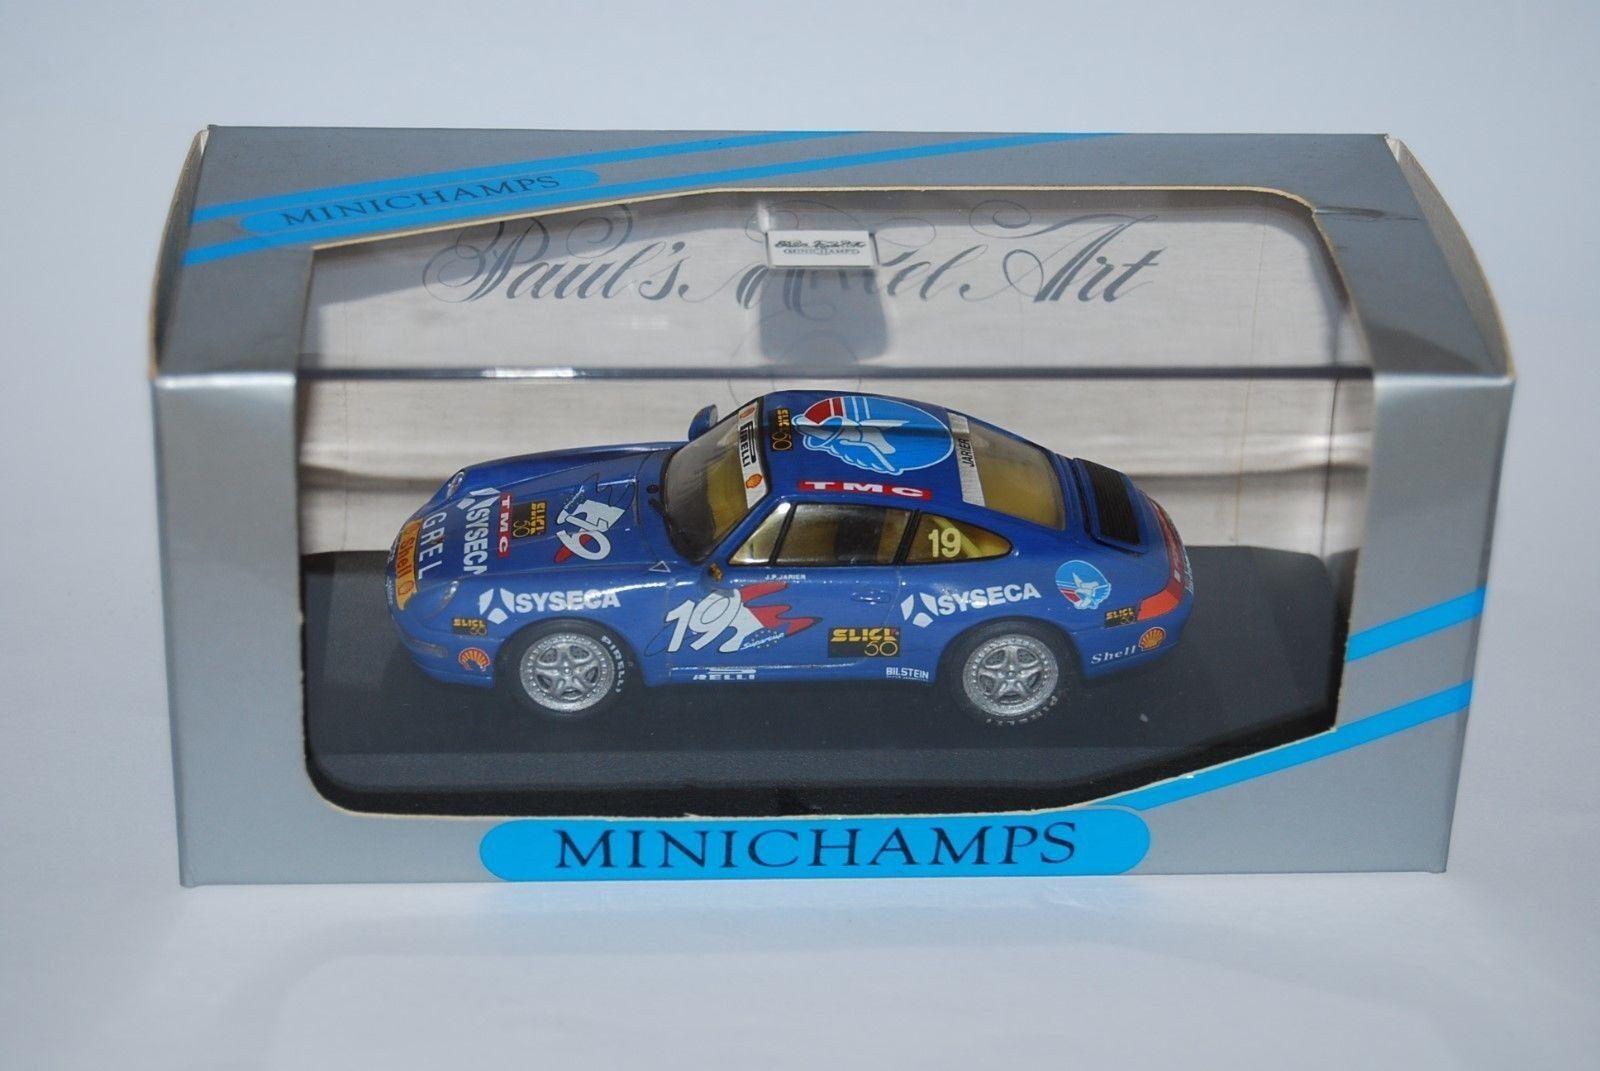 MINICHAMPS PORSCHE 911 SUPERCUP 1994 J.P. JARRIER 430946319 NEUF BOITE NEW BOX